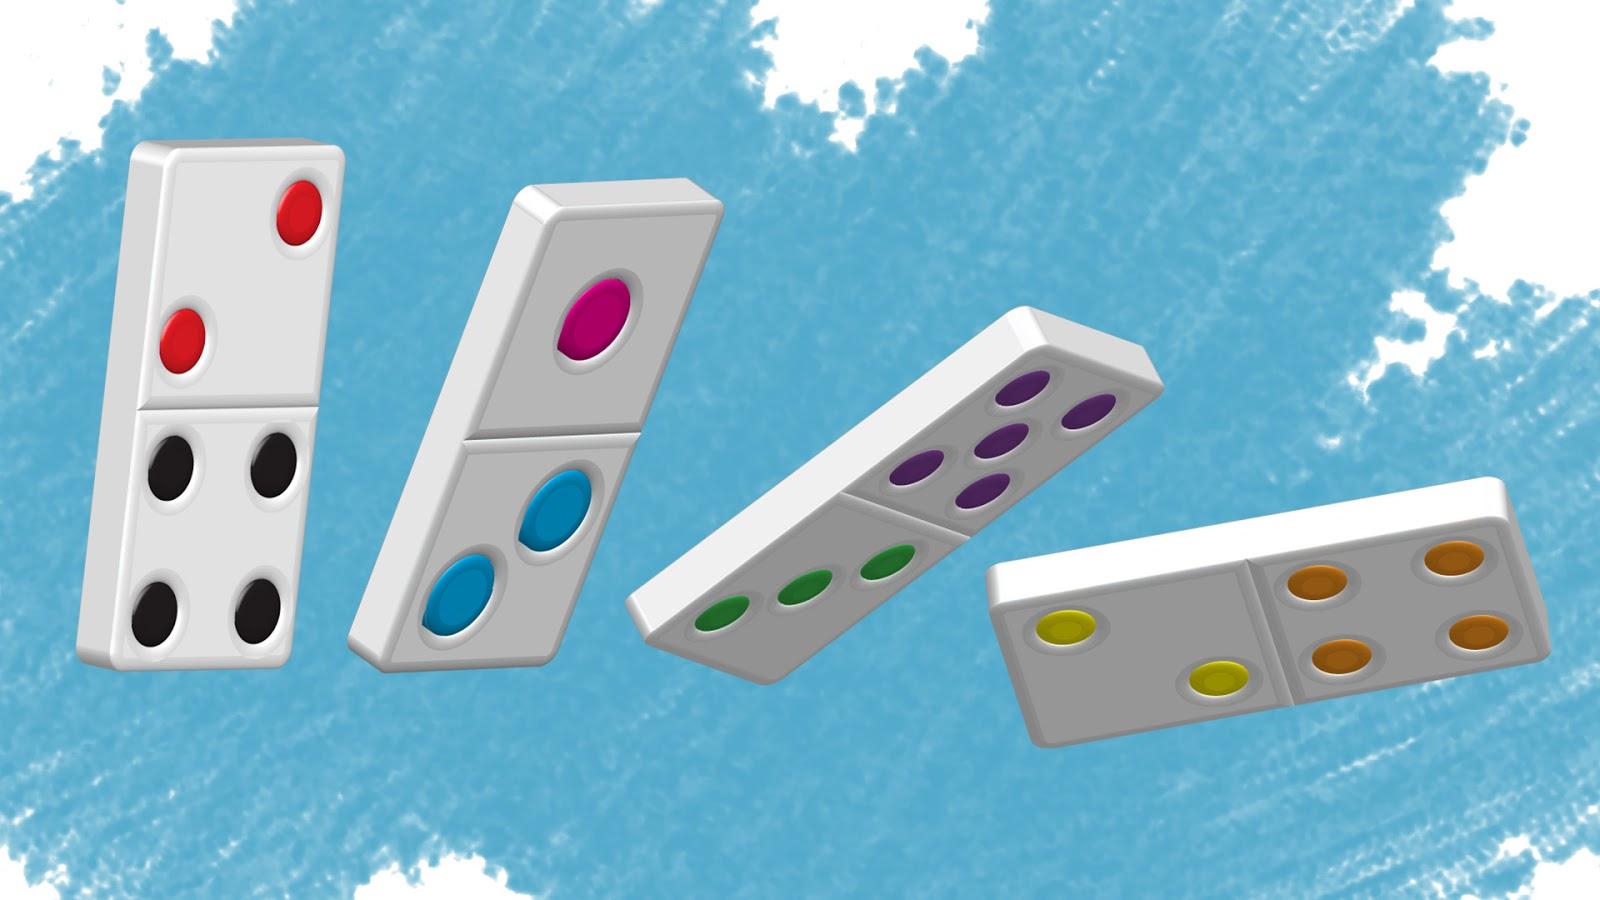 Play Gambling Joker123 Easily Through Smartphone Applications